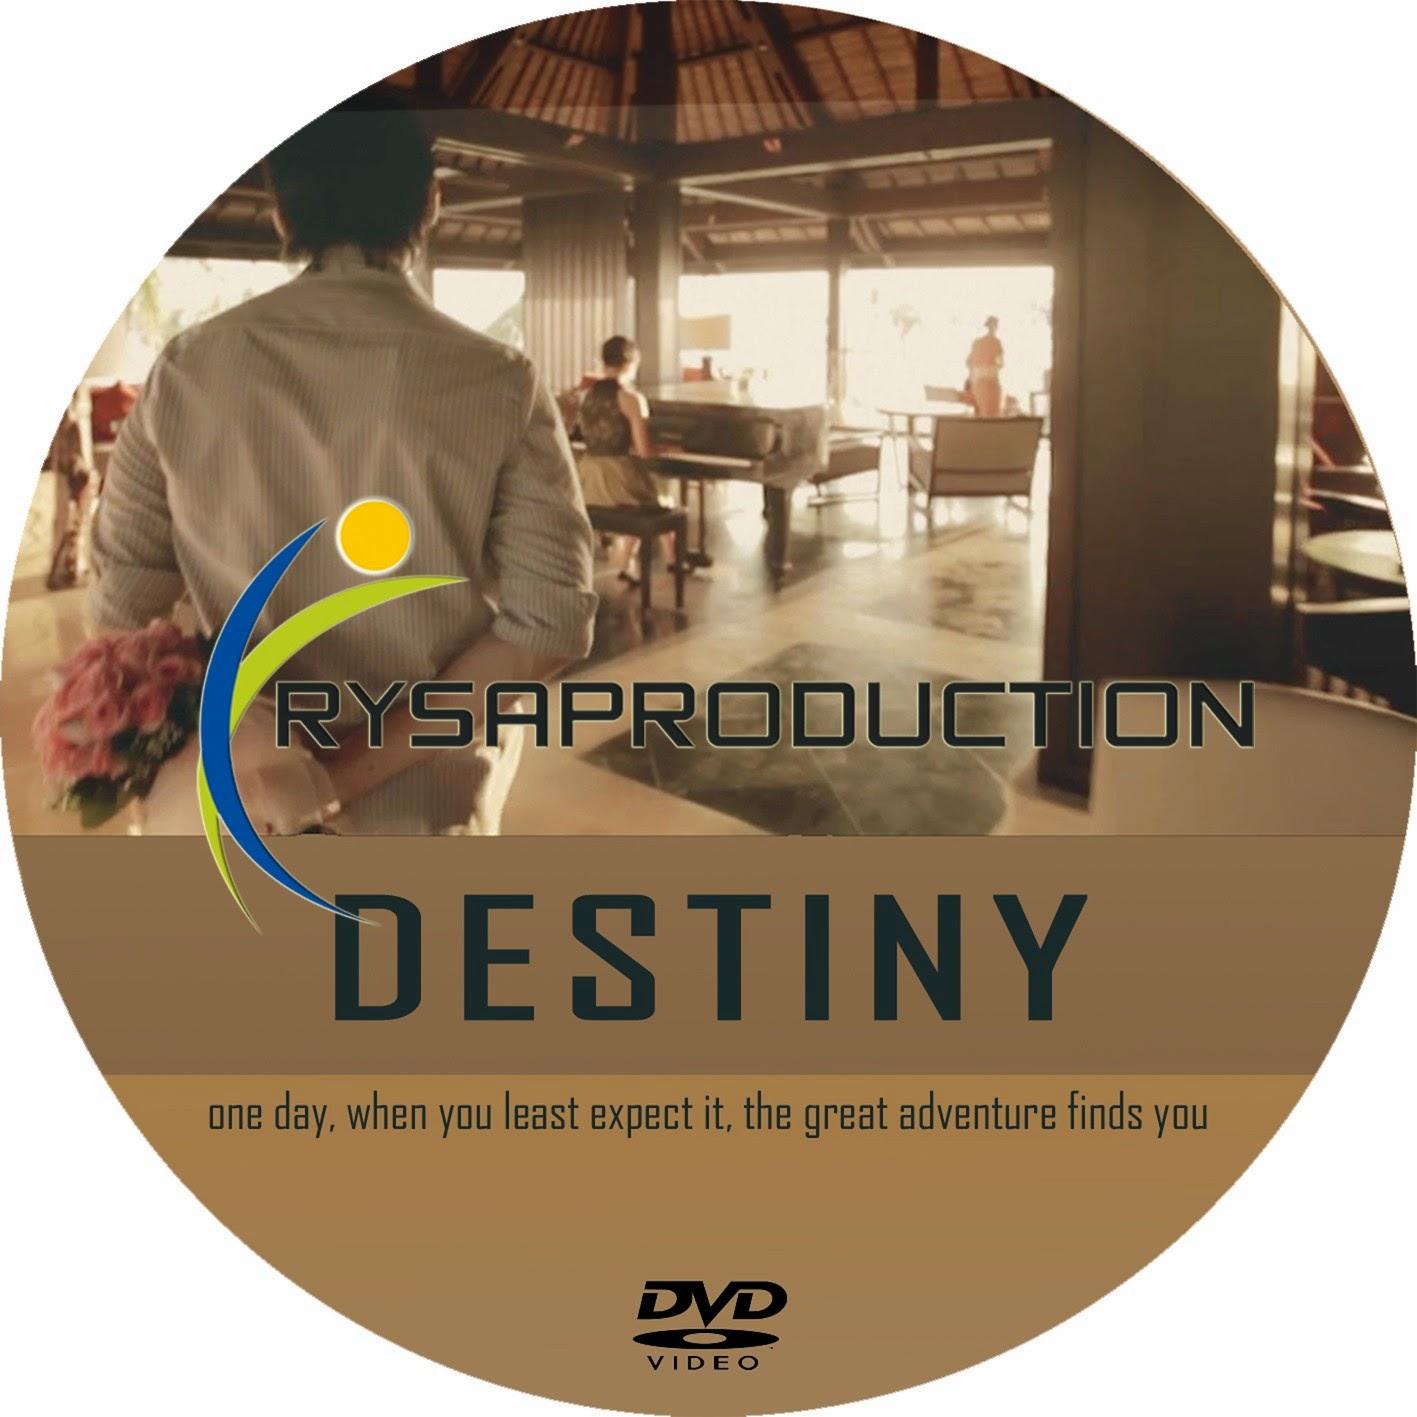 DVD Destiny